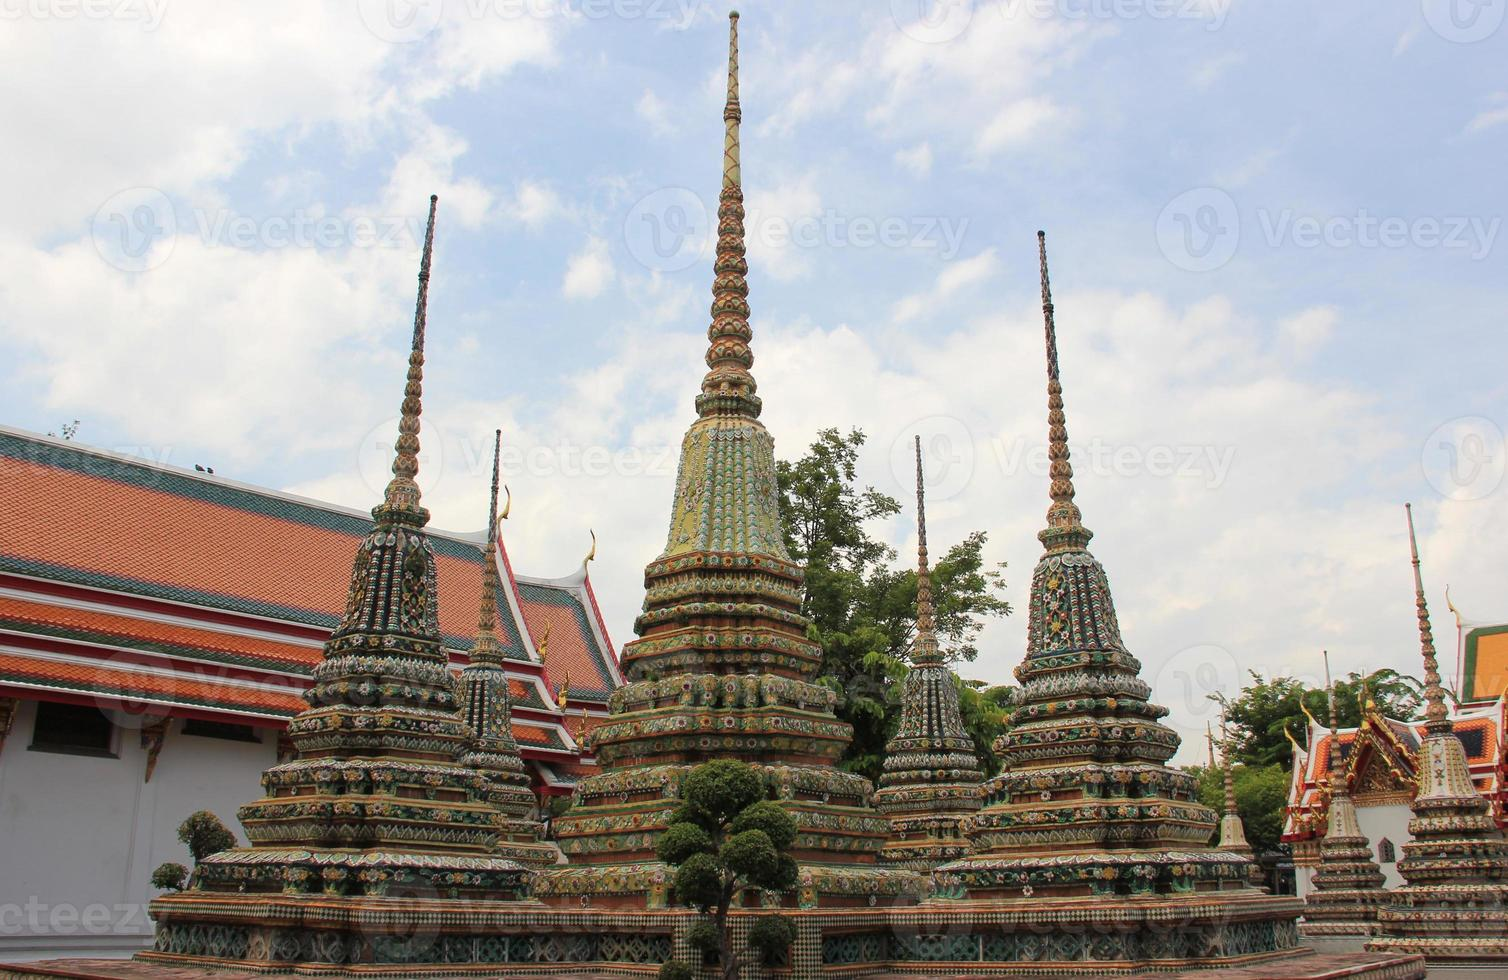 antigua pagoda en wat pho, bangkok, tailandia foto